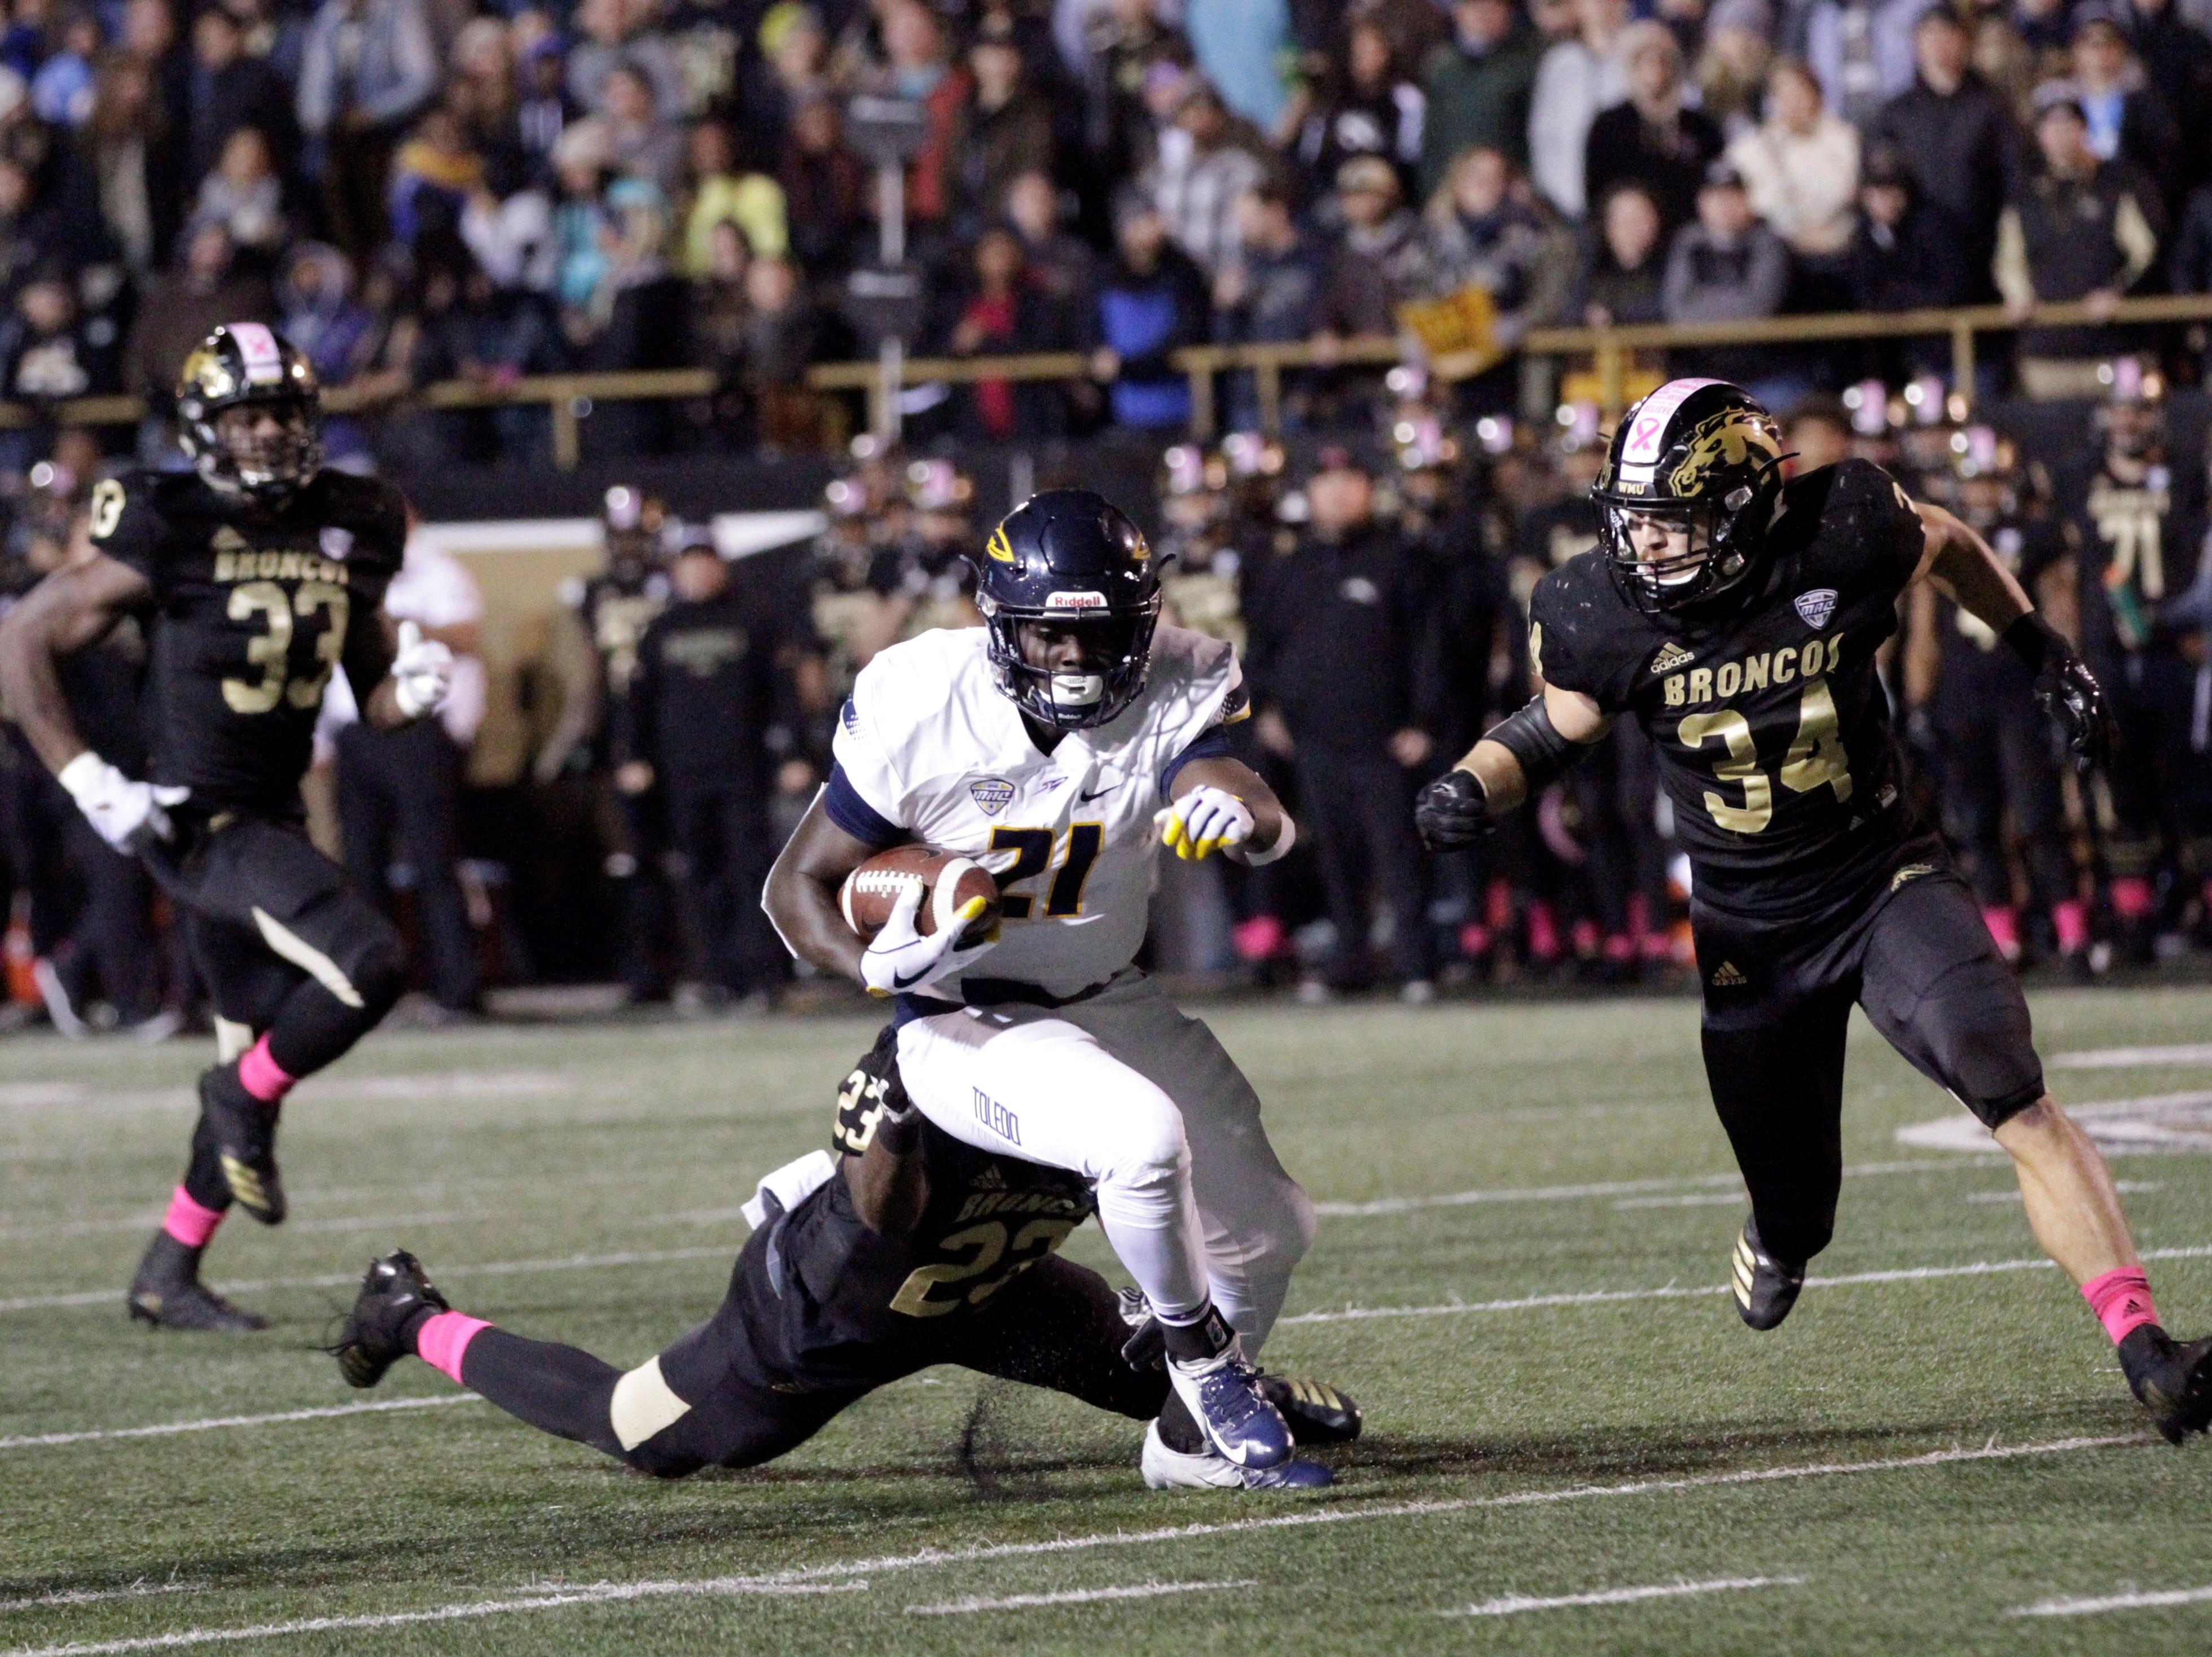 Toledo running back Shakif Seymour (21) attempts to break free from Western Michigan linebacker Treshaun Hayward at Waldo Stadium in Kalamazoo on Thursday, October 25, 2018.